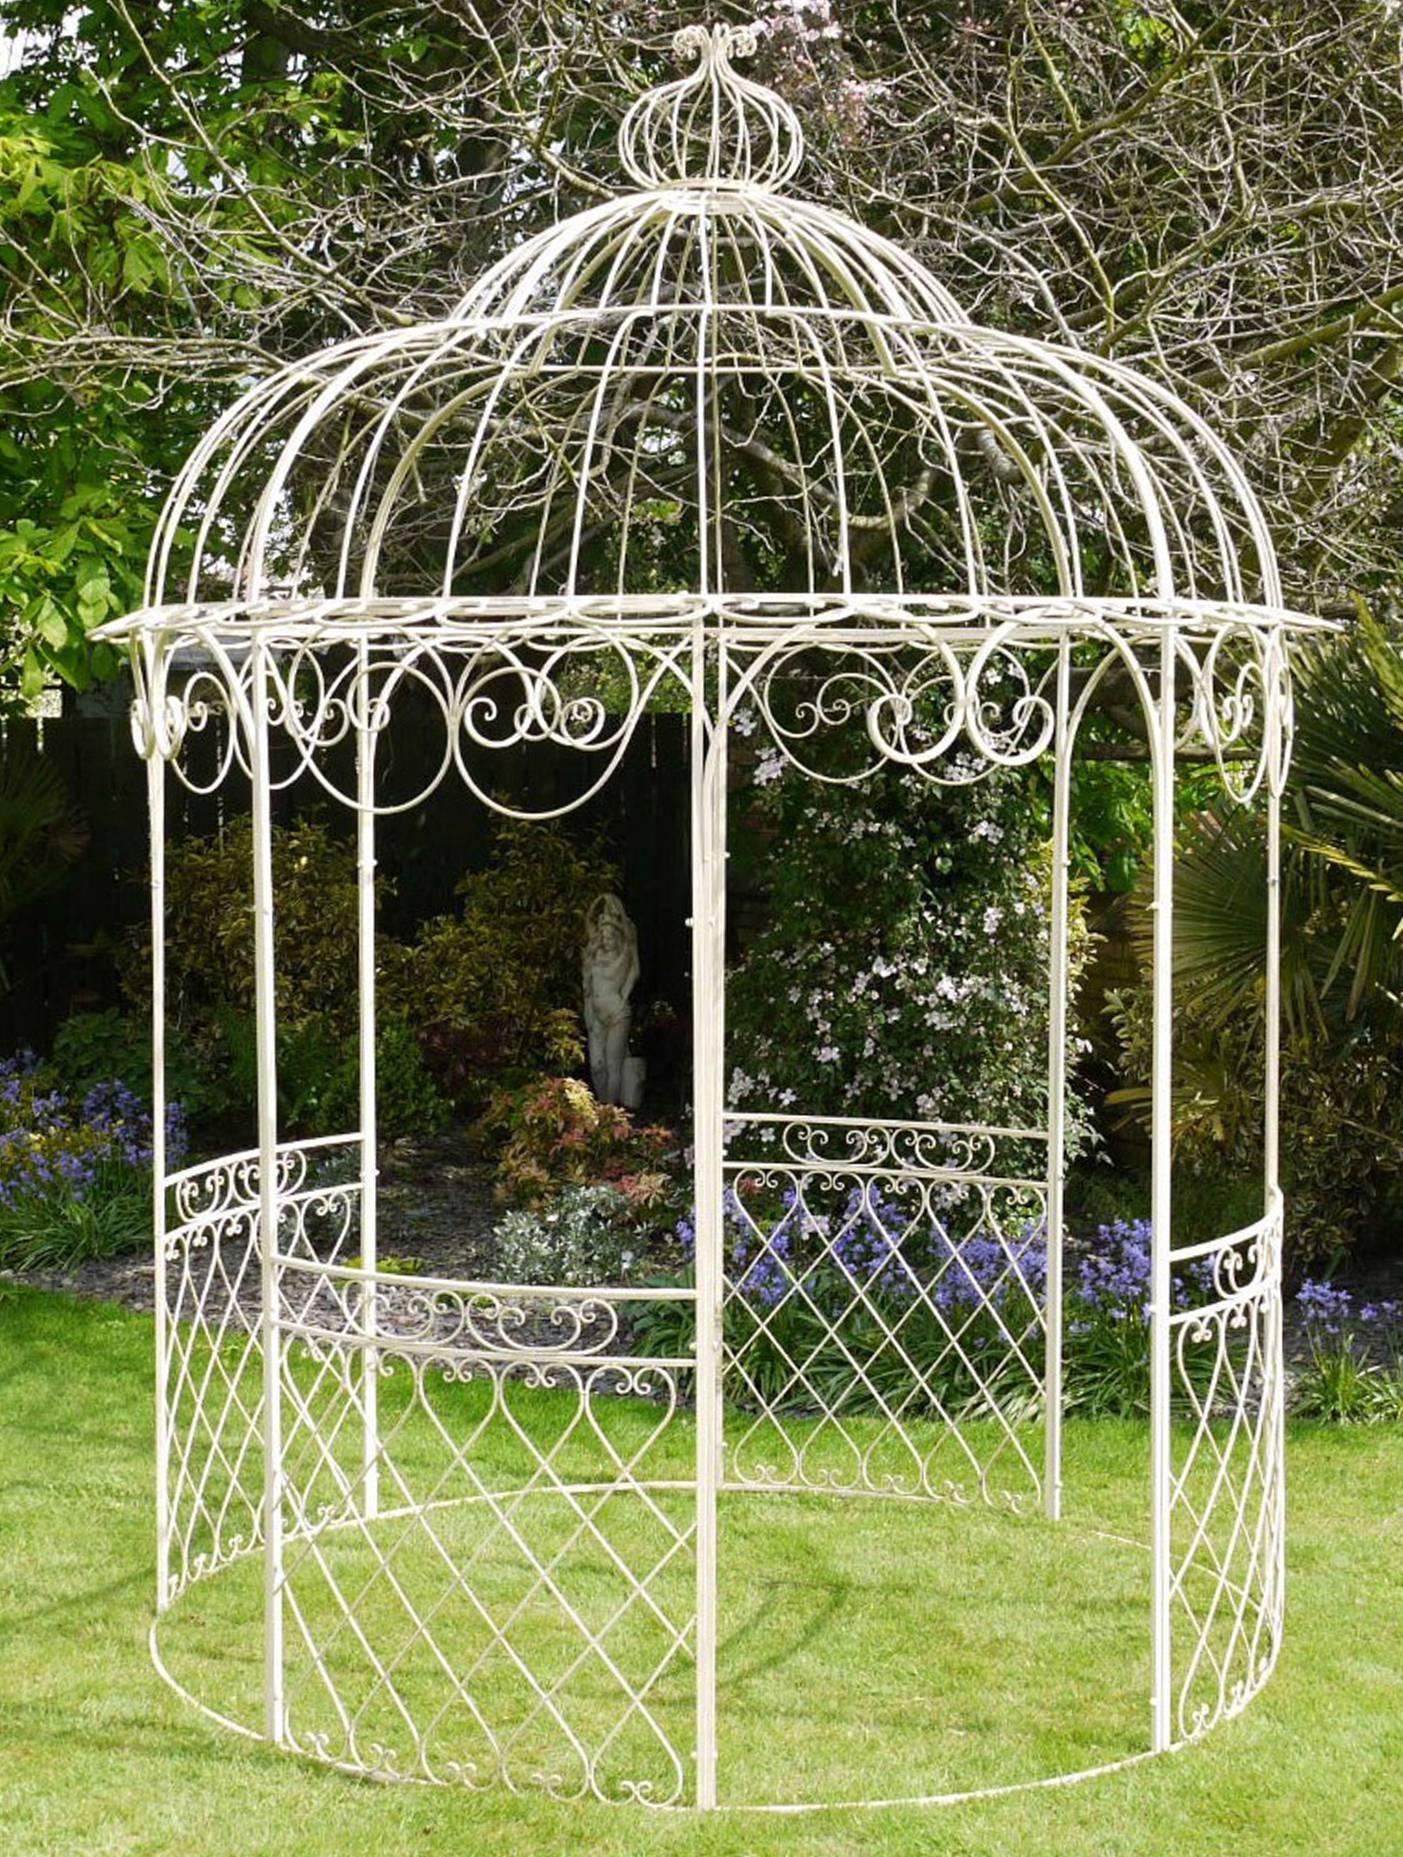 Best tonnelle de jardin en fer forge photos awesome - Abris de jardin en fer ...